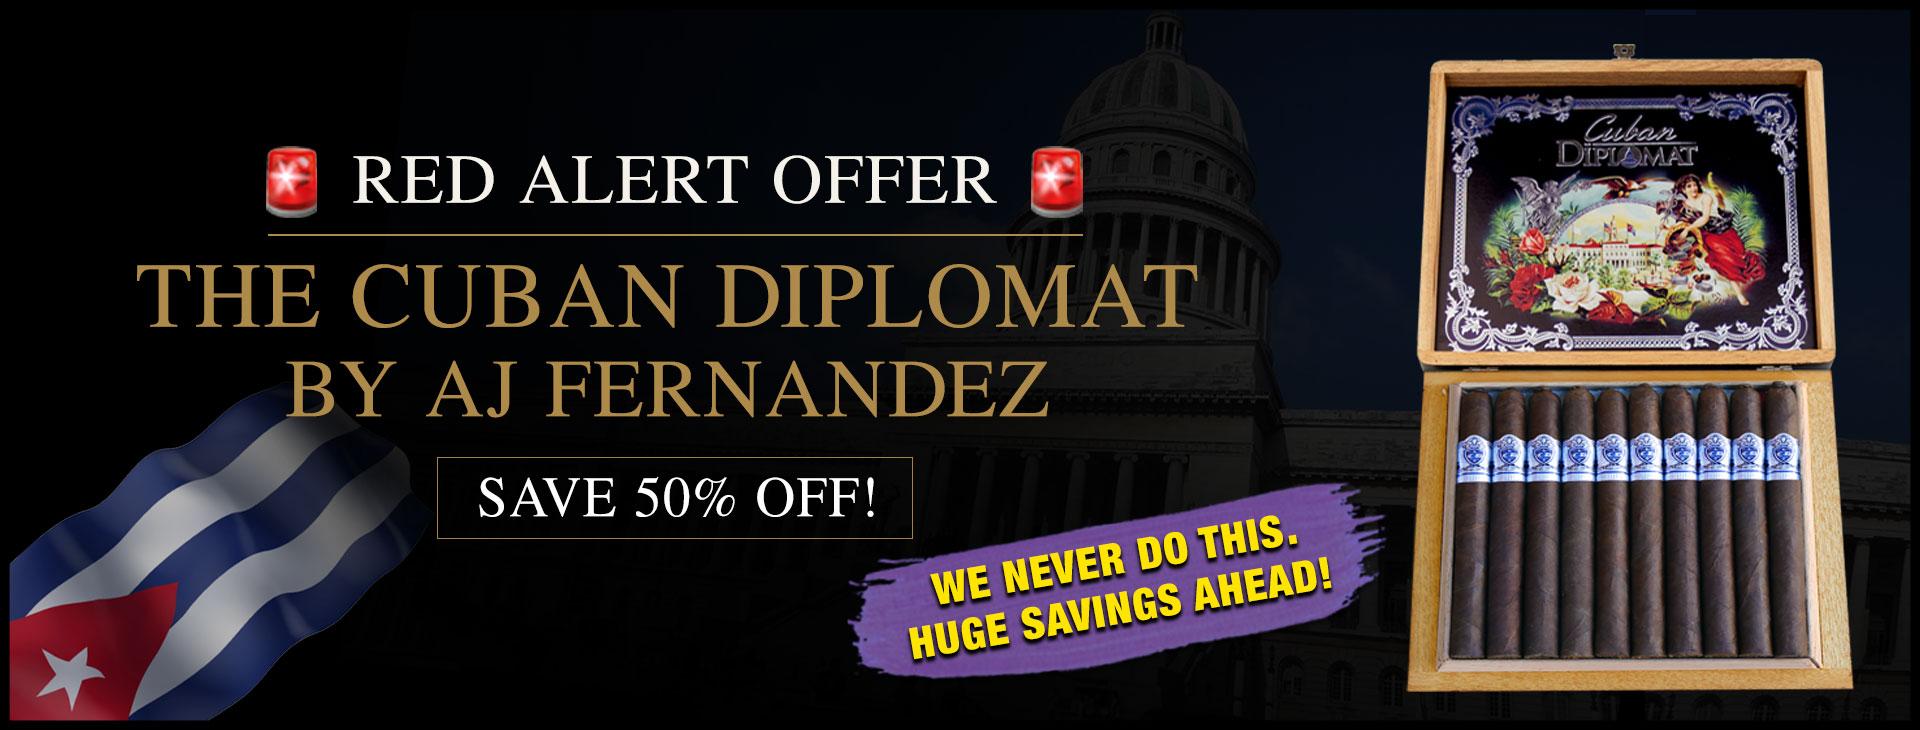 cuban-diplomat-2021-banner-6.jpg